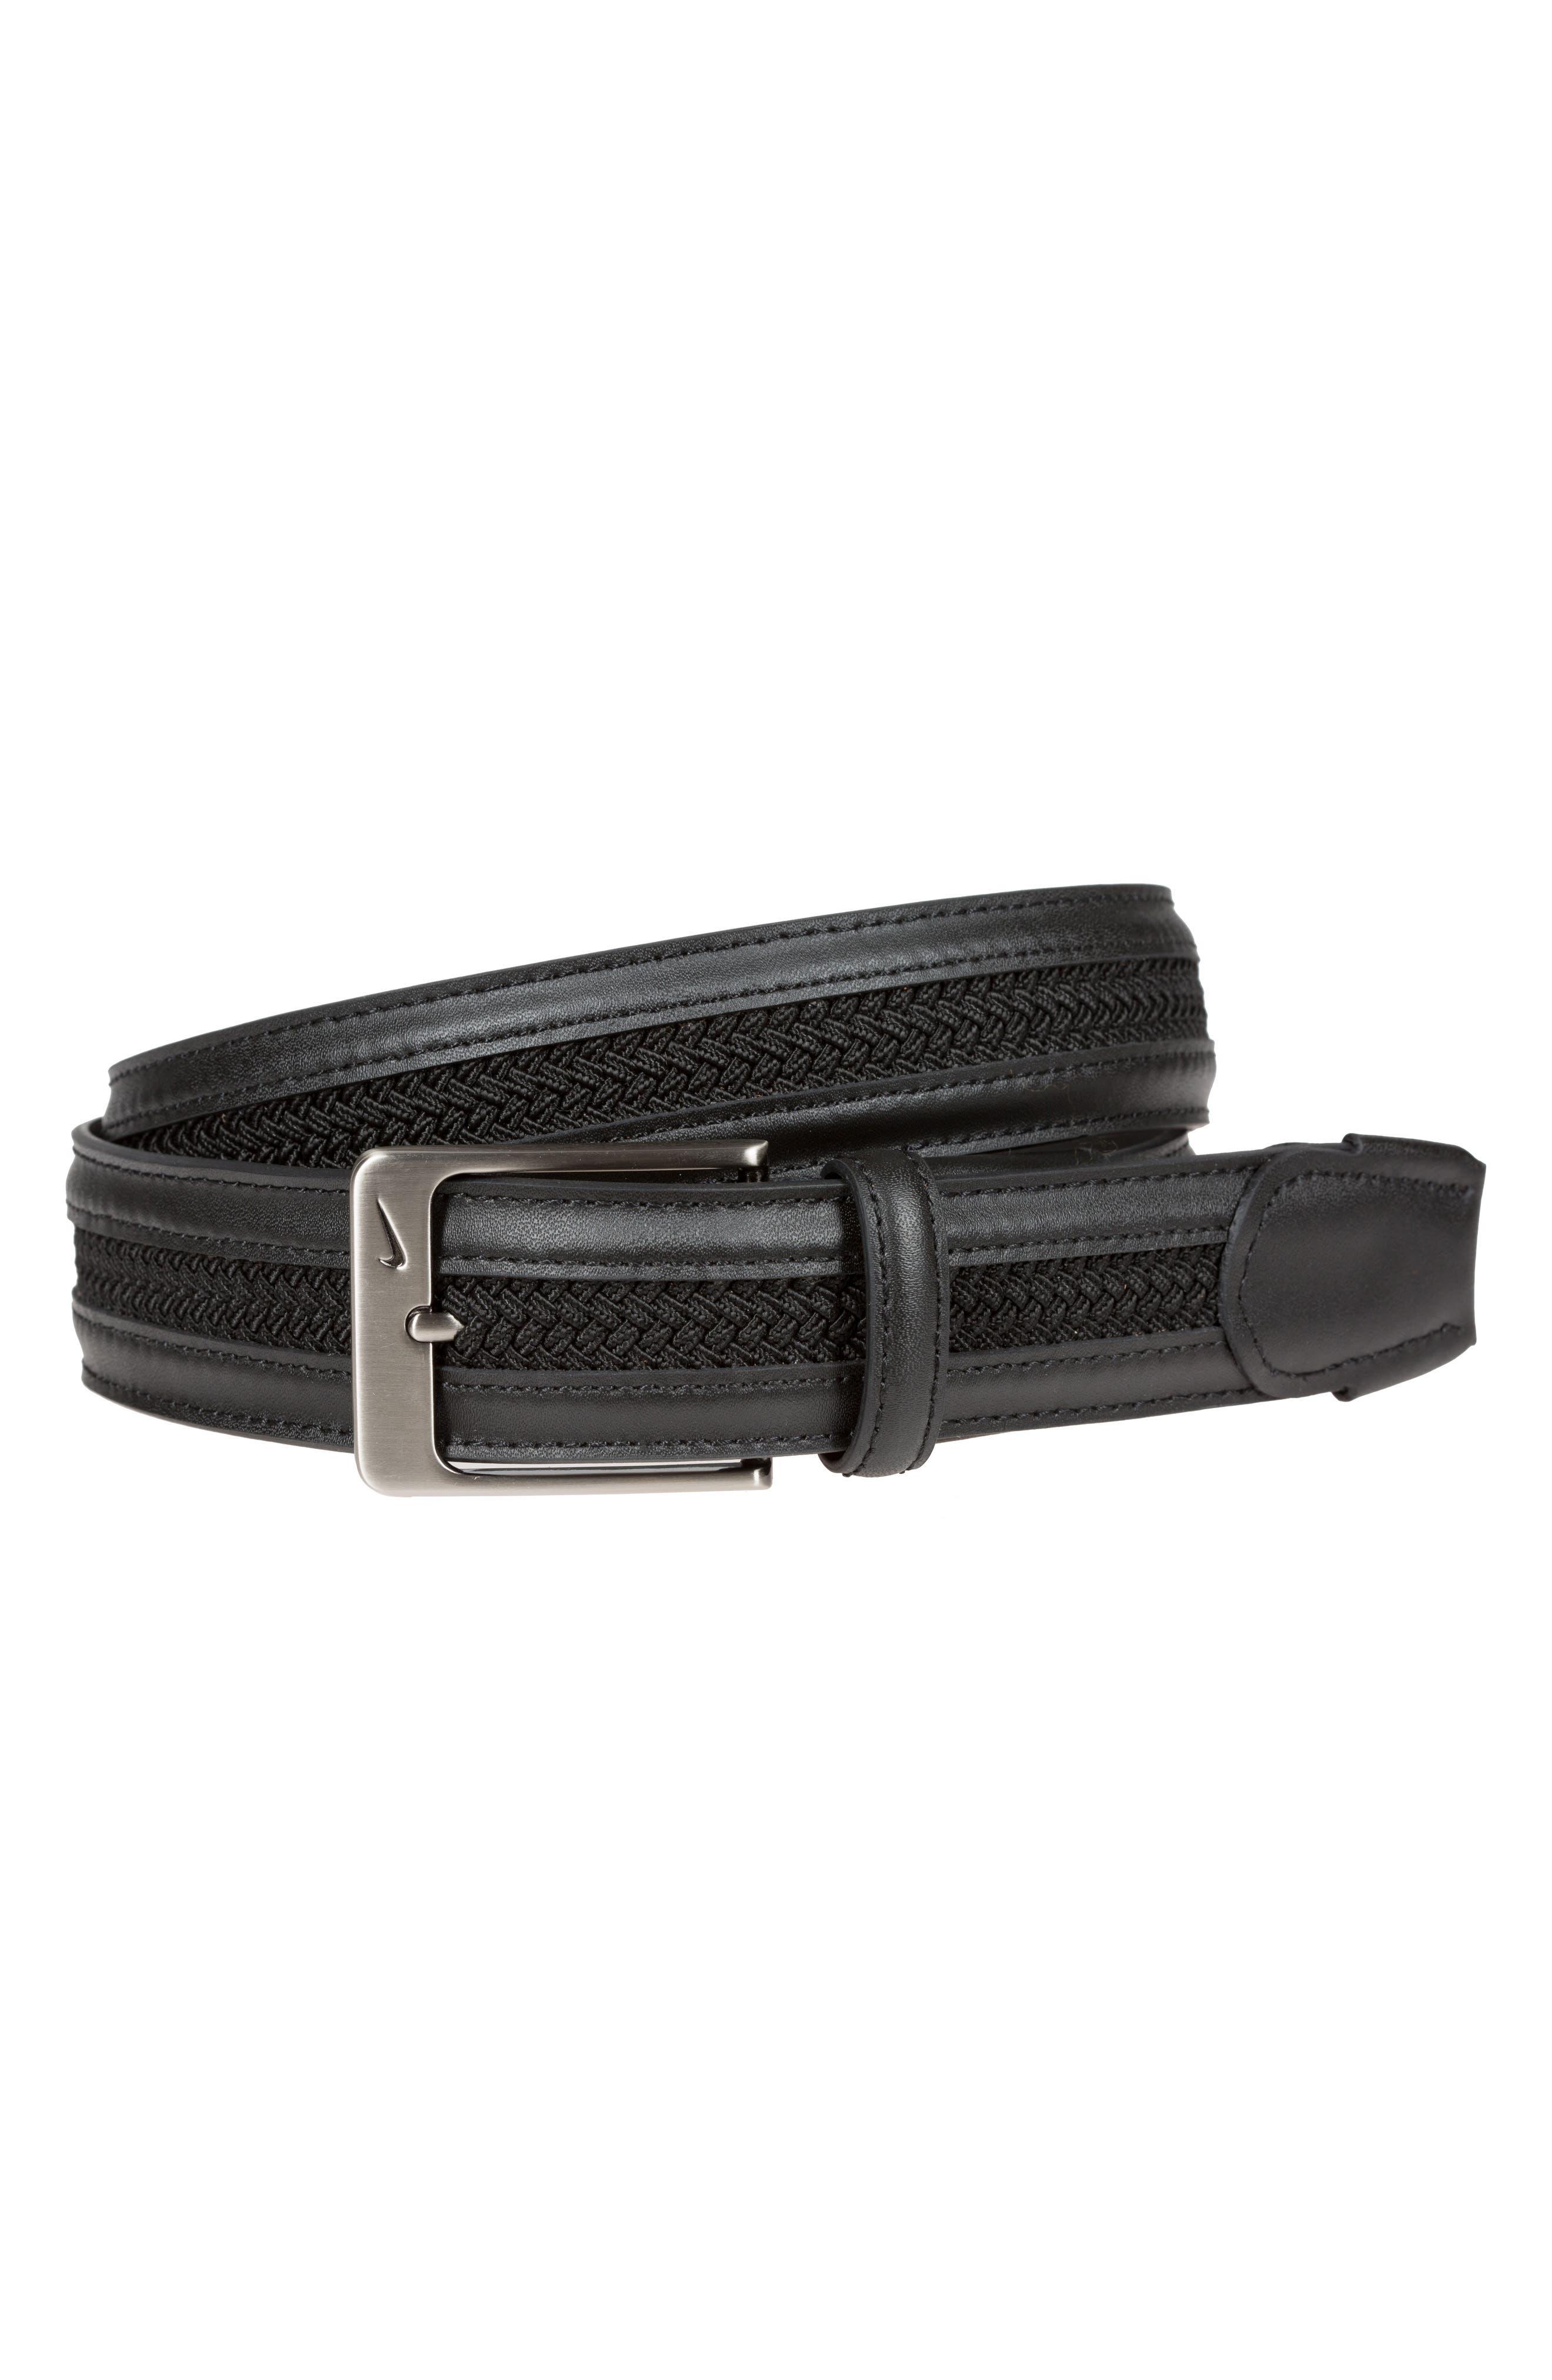 Main Image - Nike G-Flex Belt